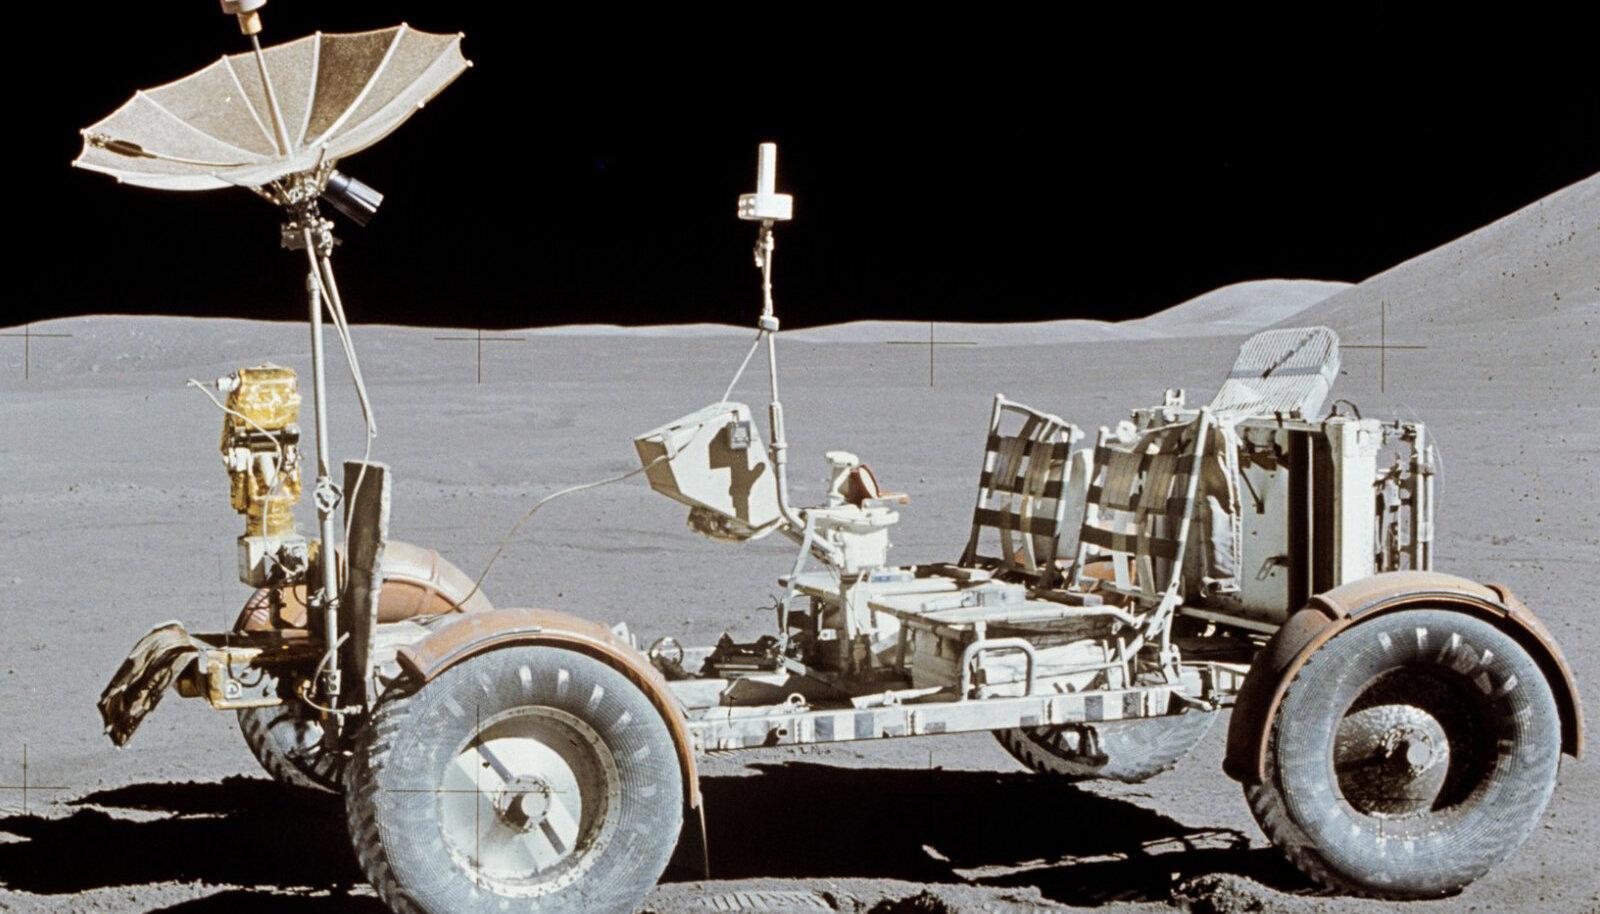 "Esimene ""autosõit"" Kuul toimus sellise masinaga (foto: NASA / CC BY-SA 4.0 / Wikimedia Commons)"